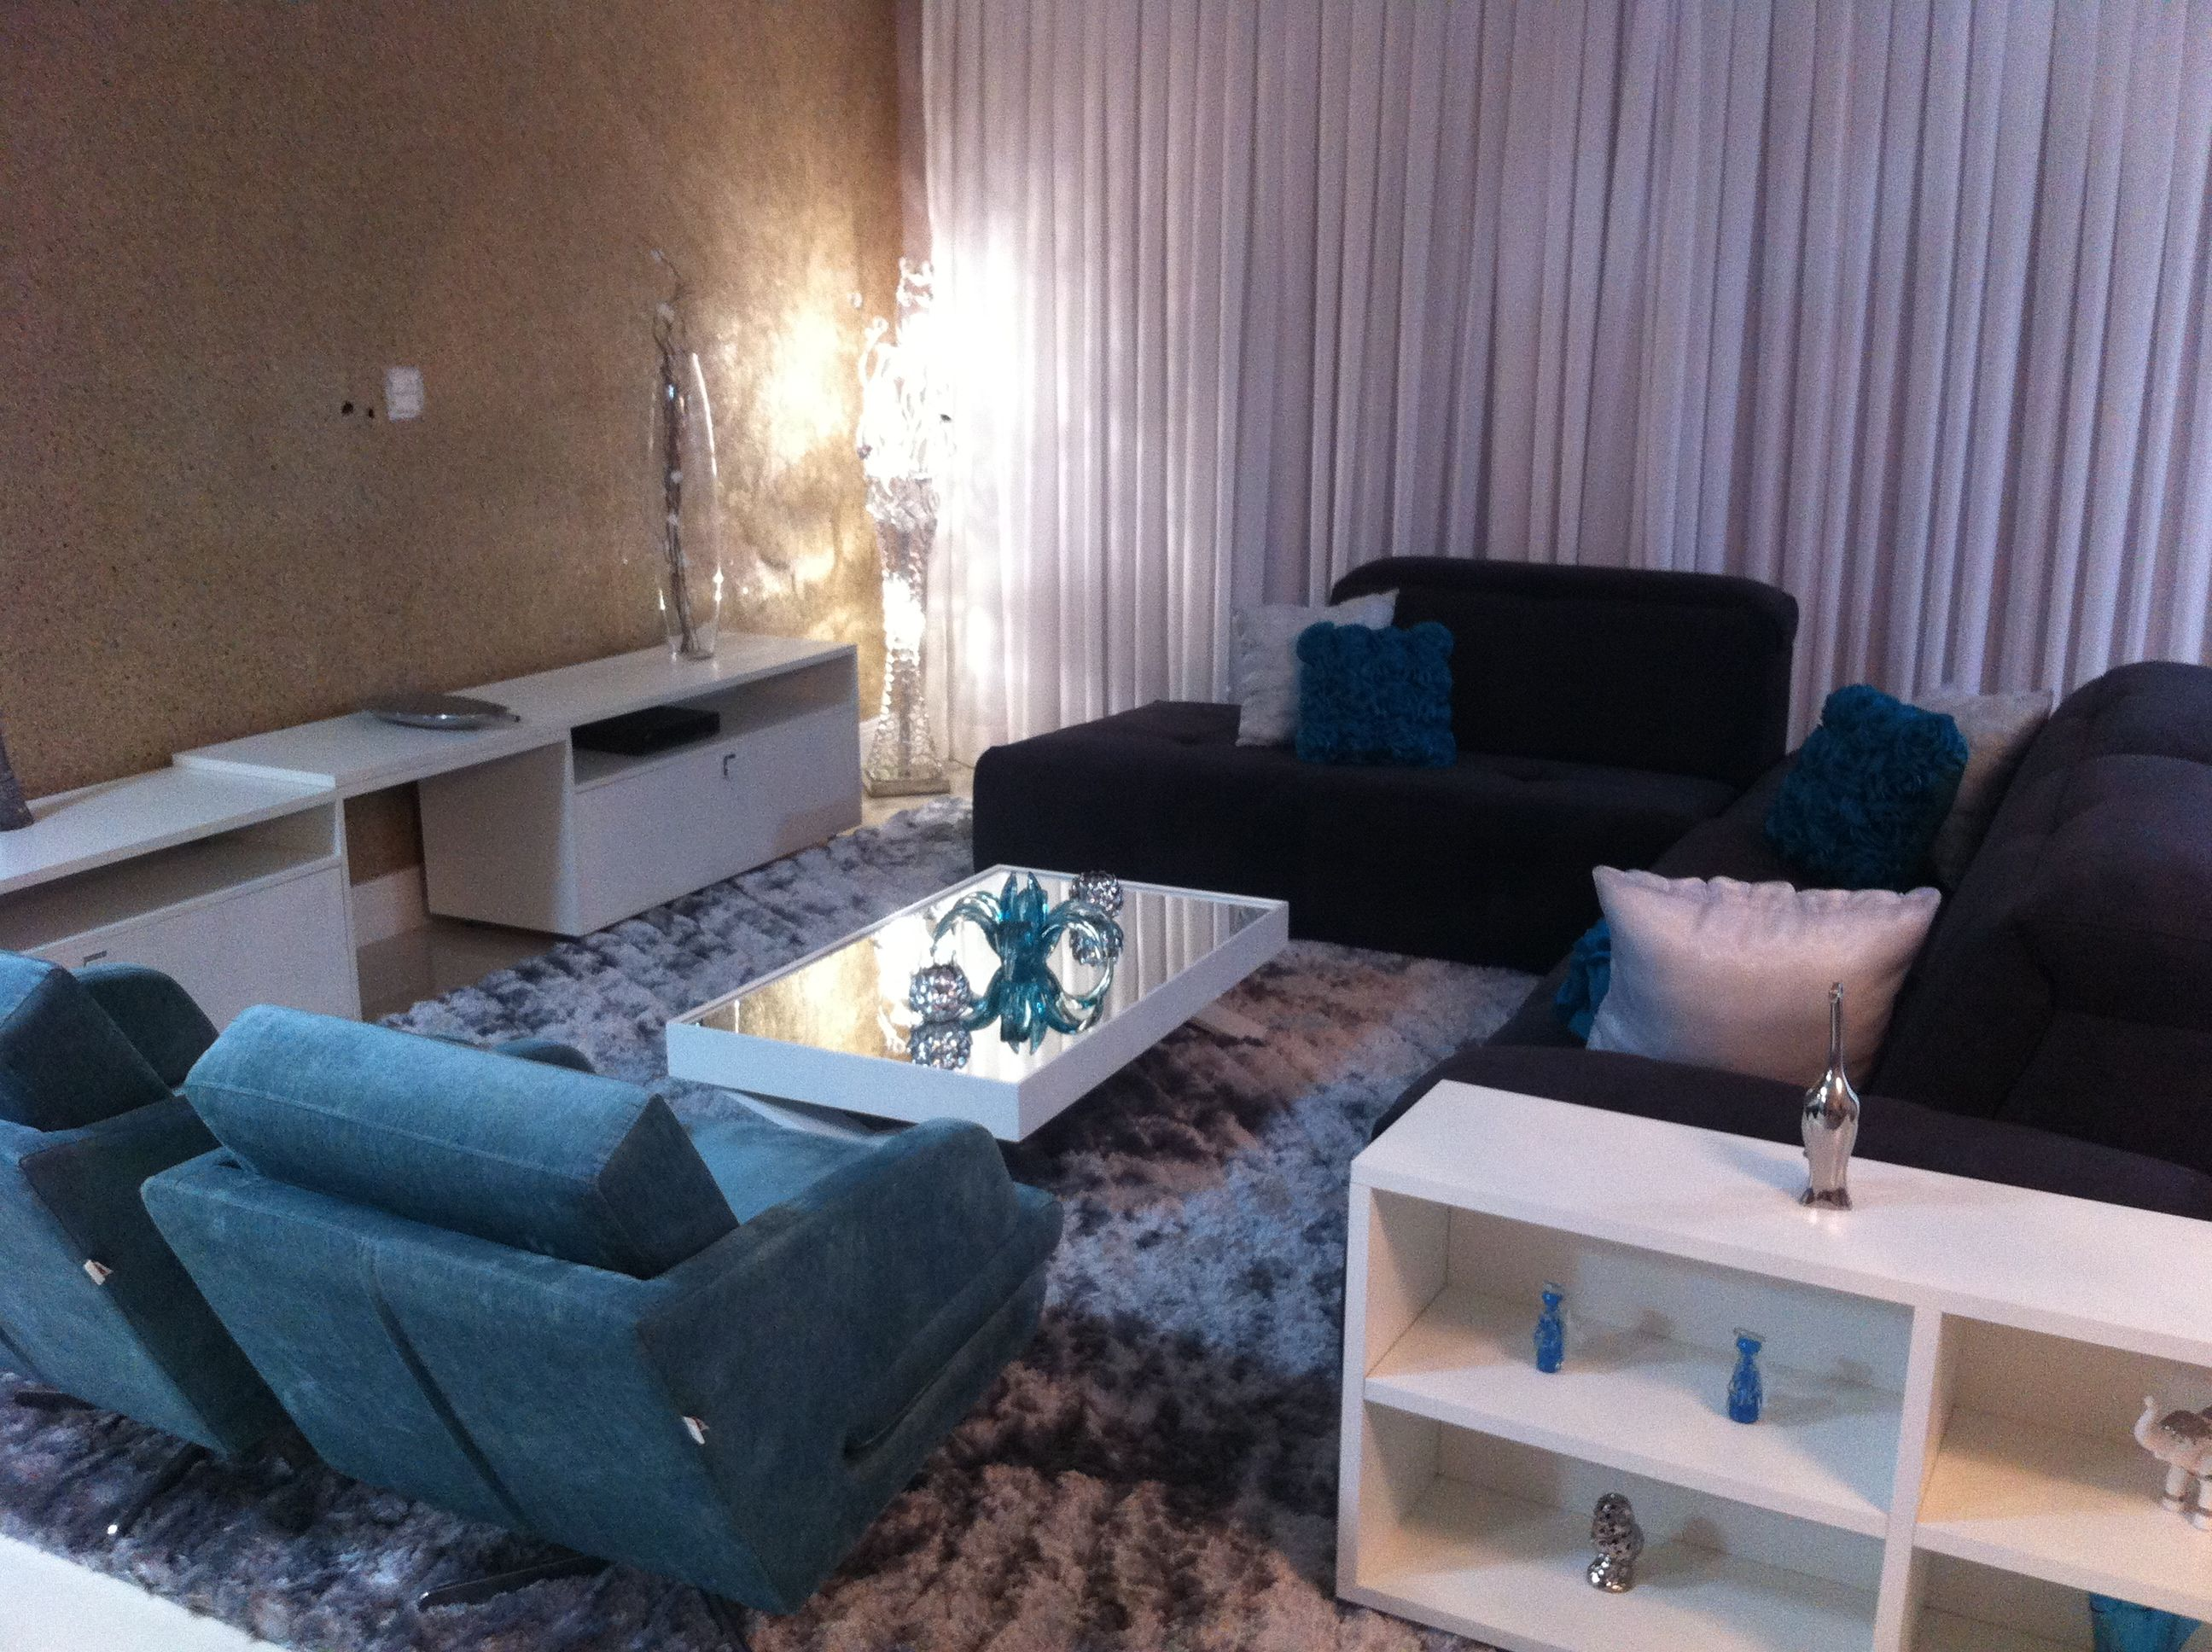 Cortina voil e almofada tifanny azul turquesa sala tv for Cortinas azul turquesa